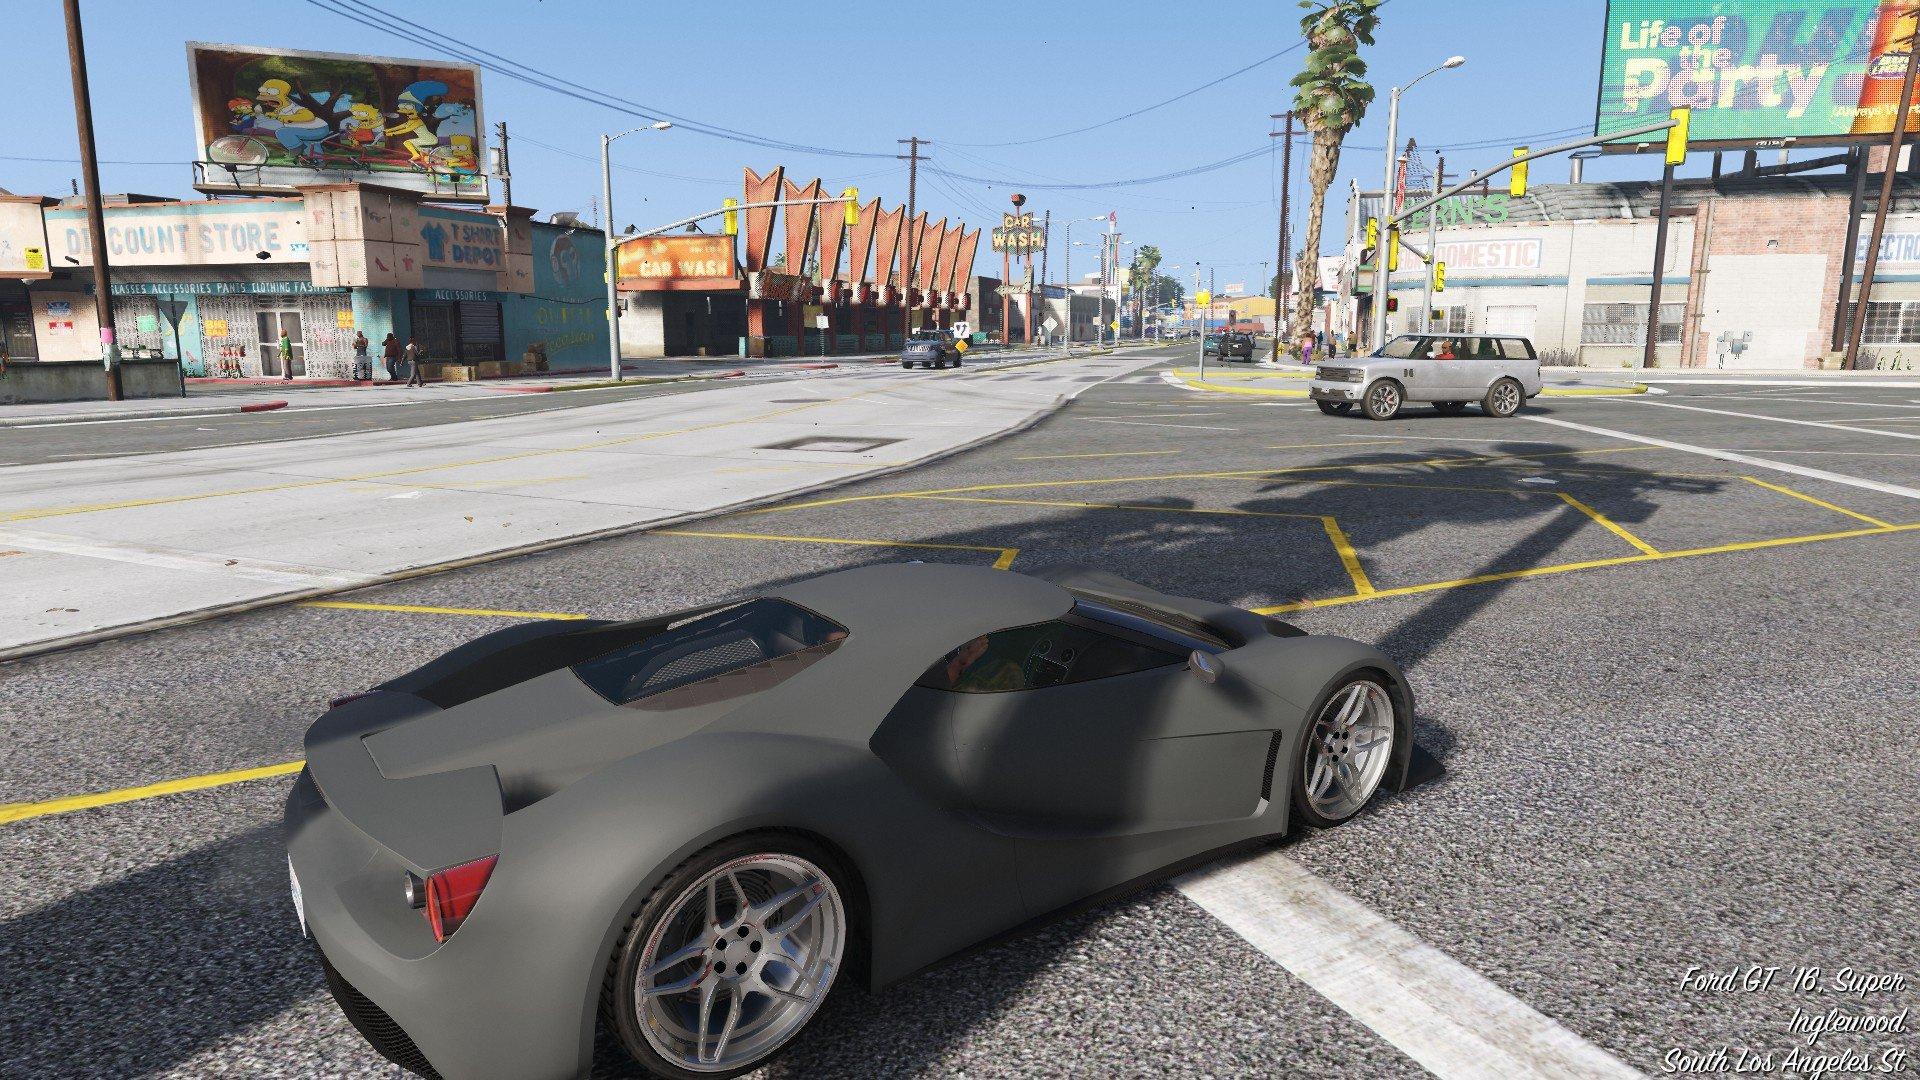 Real Life Car/Location Names